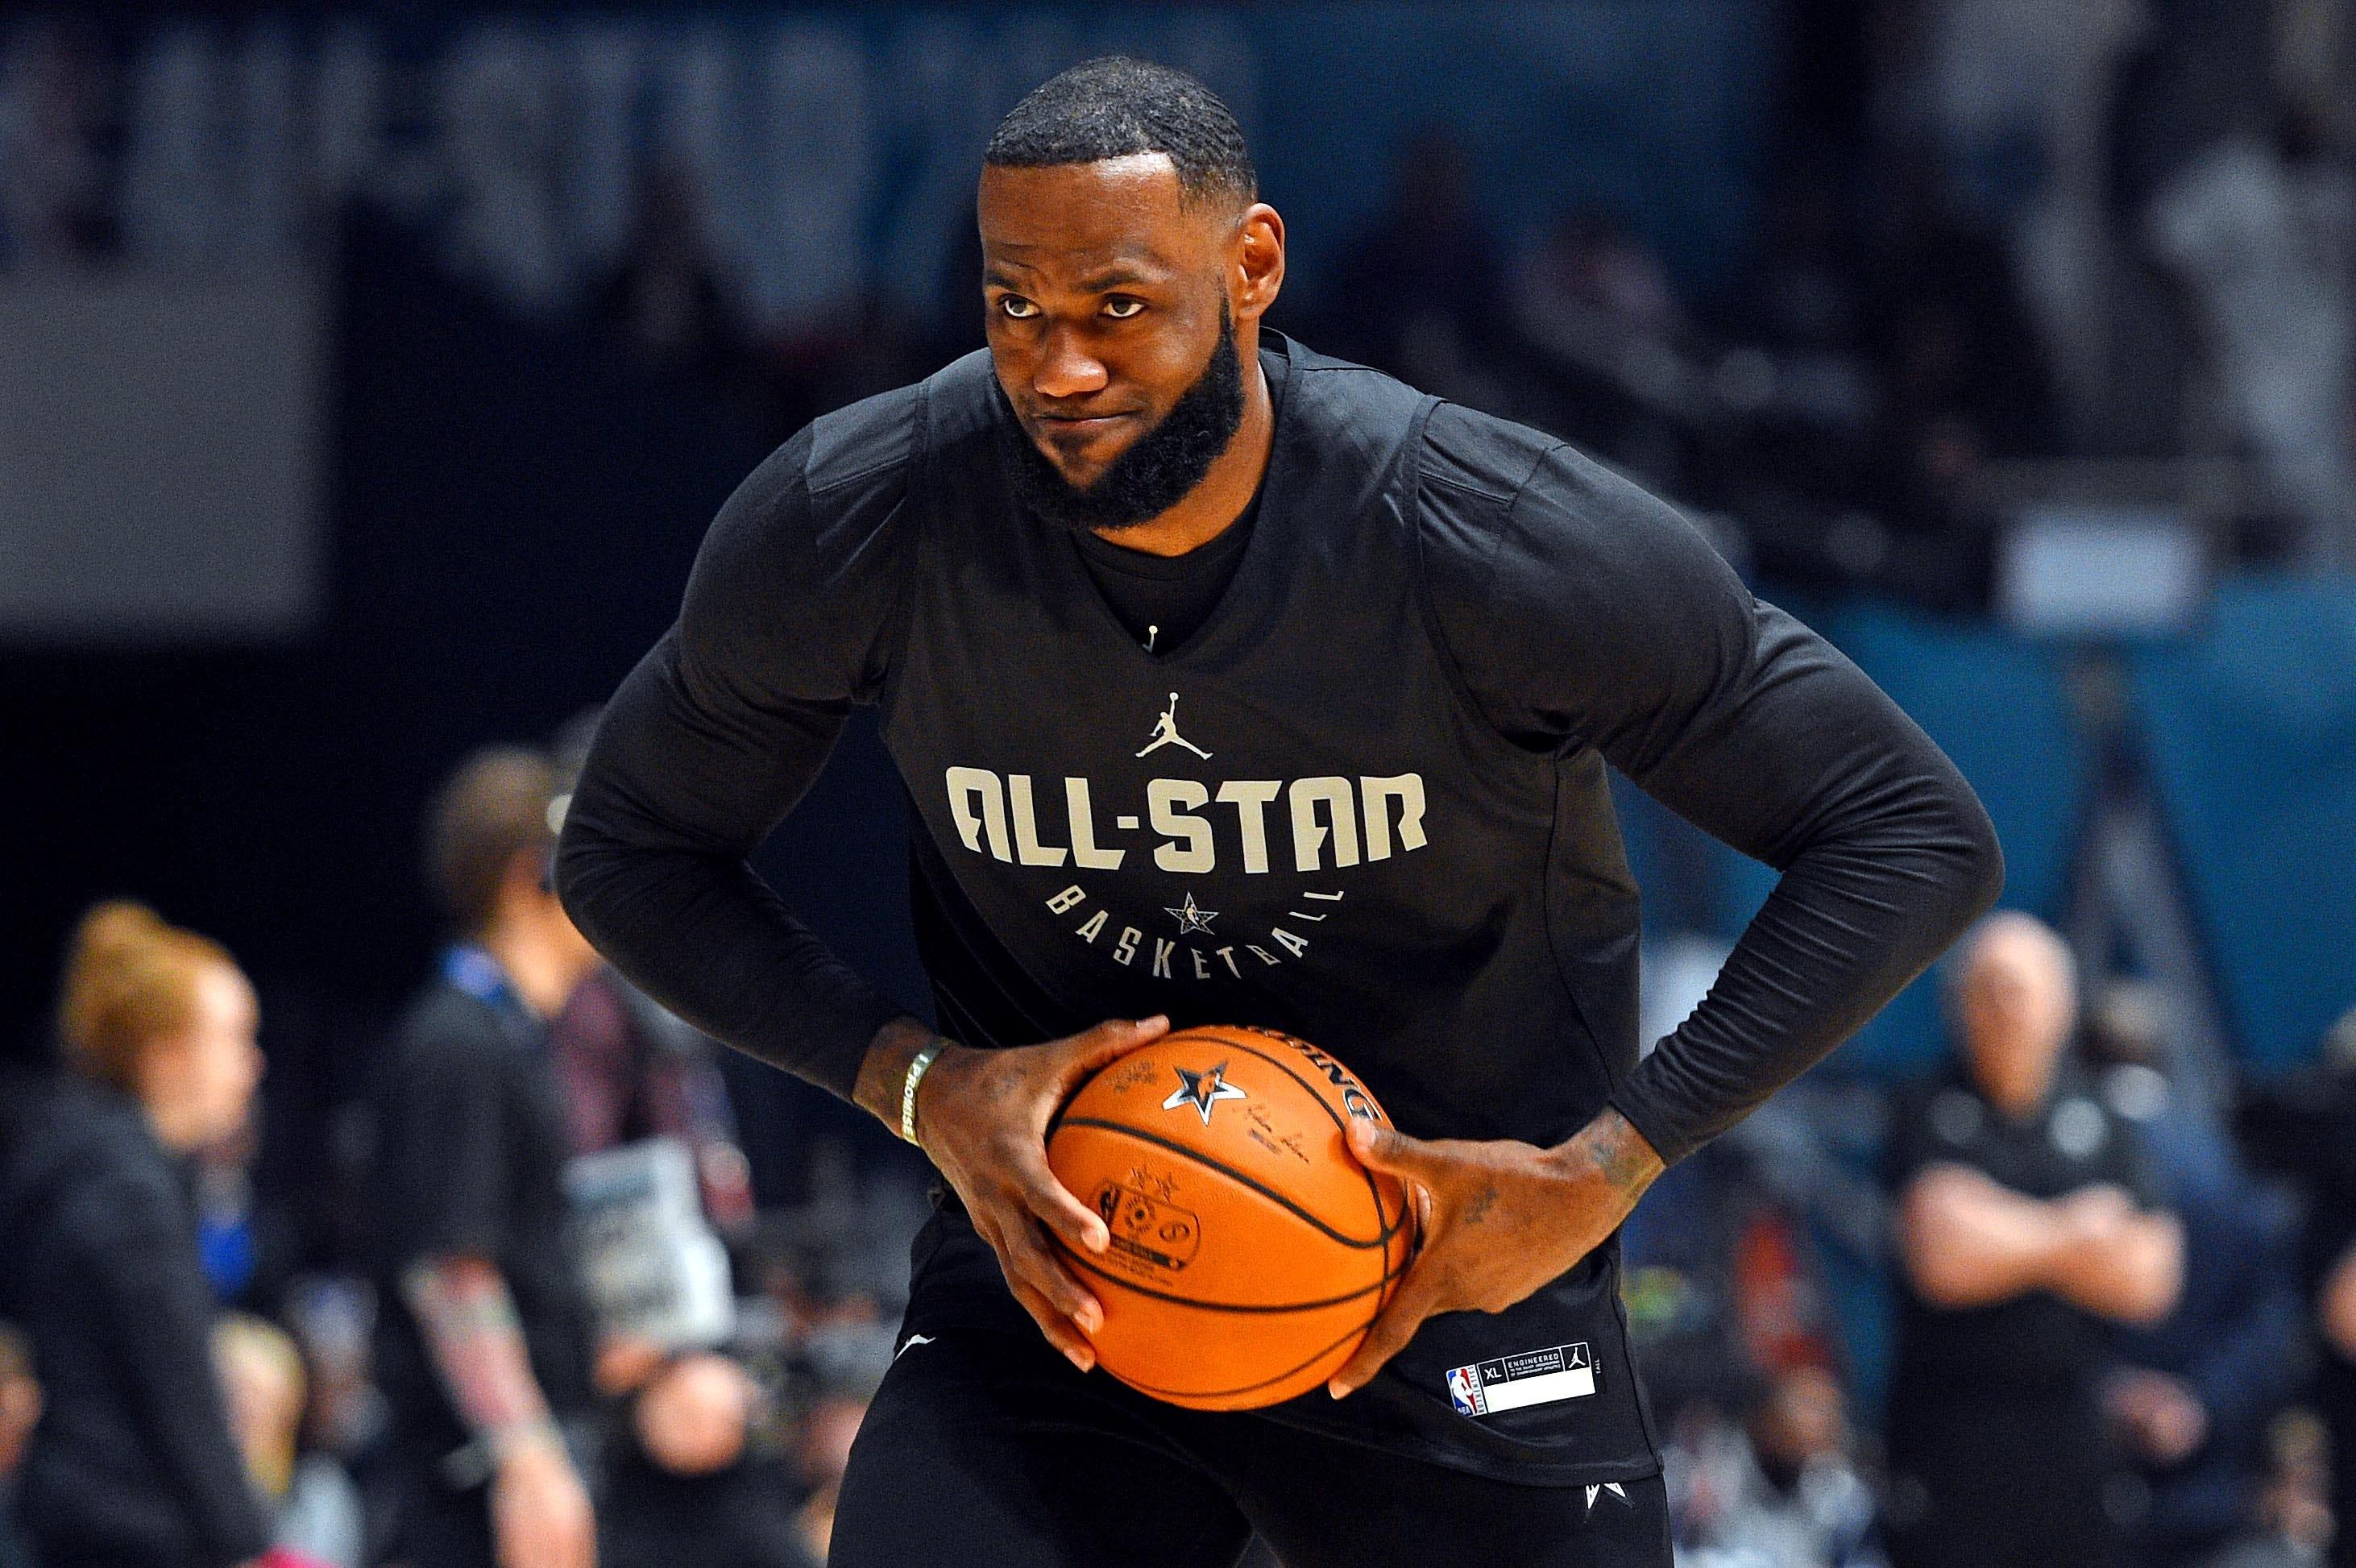 LeBron James on Colin Kaepernick: 'I stand with Kap, I kneel with Kap'